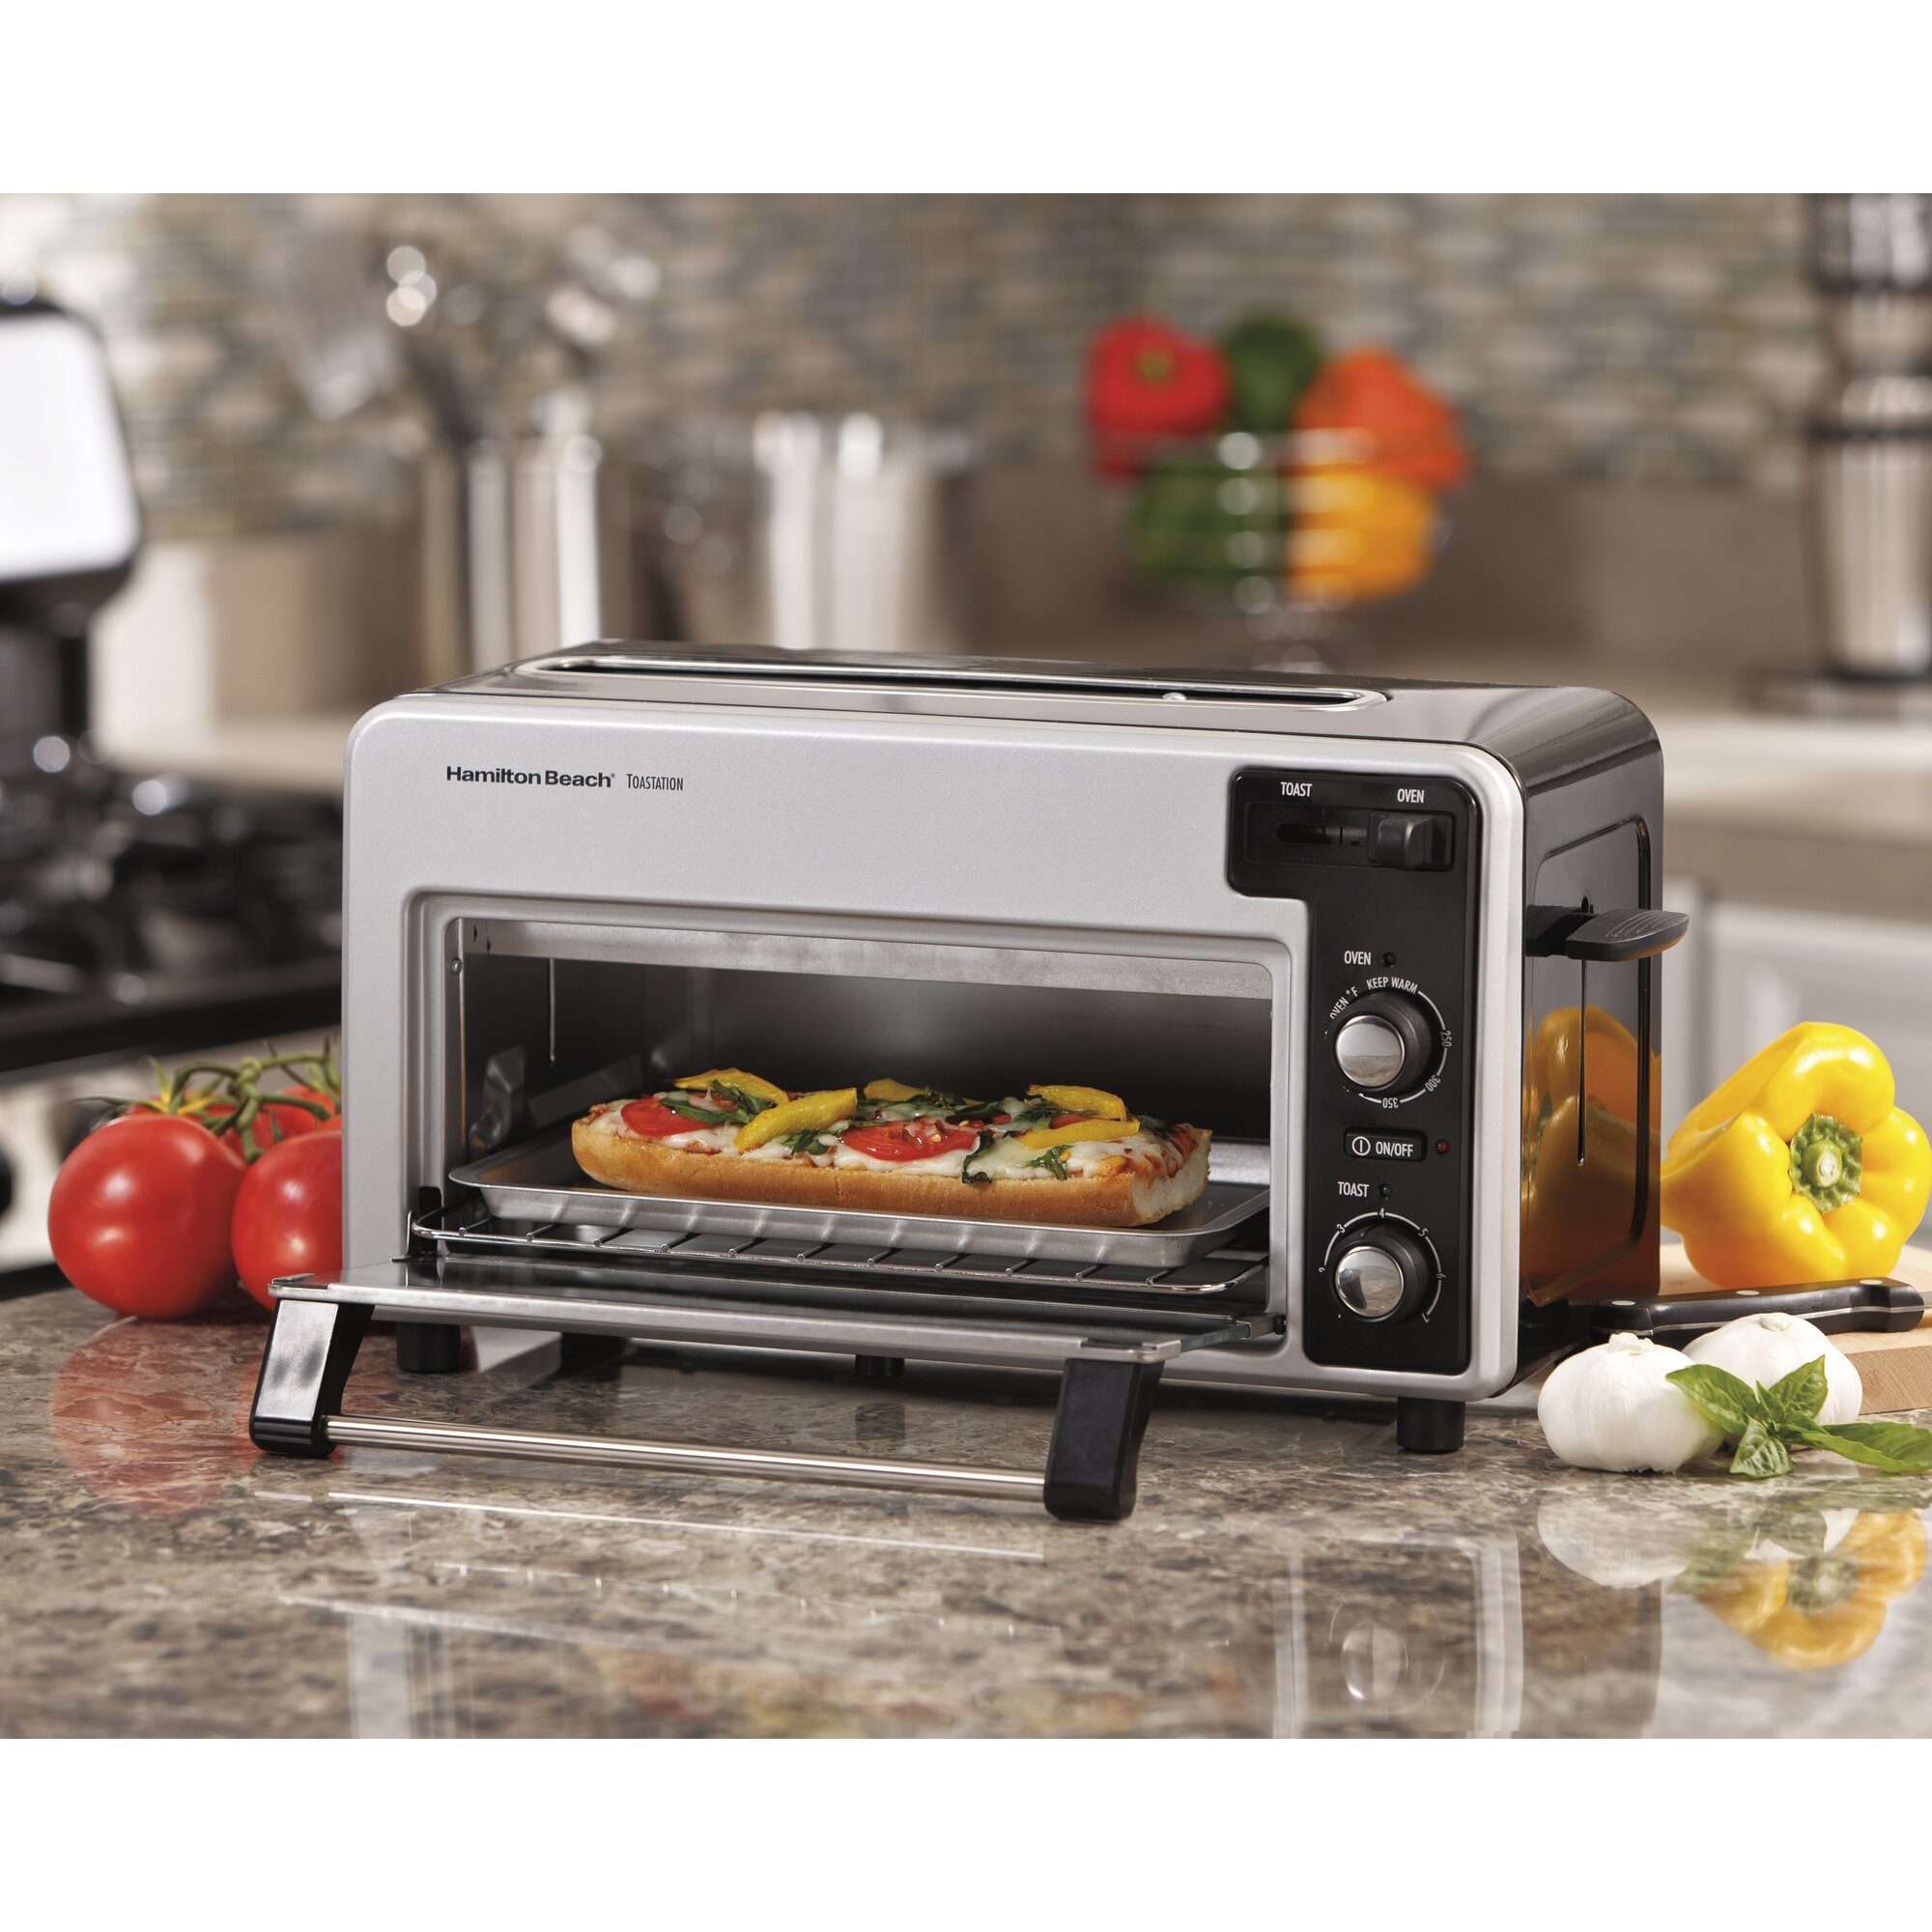 Toastationbination Toaster & Toaster Oven How To Make